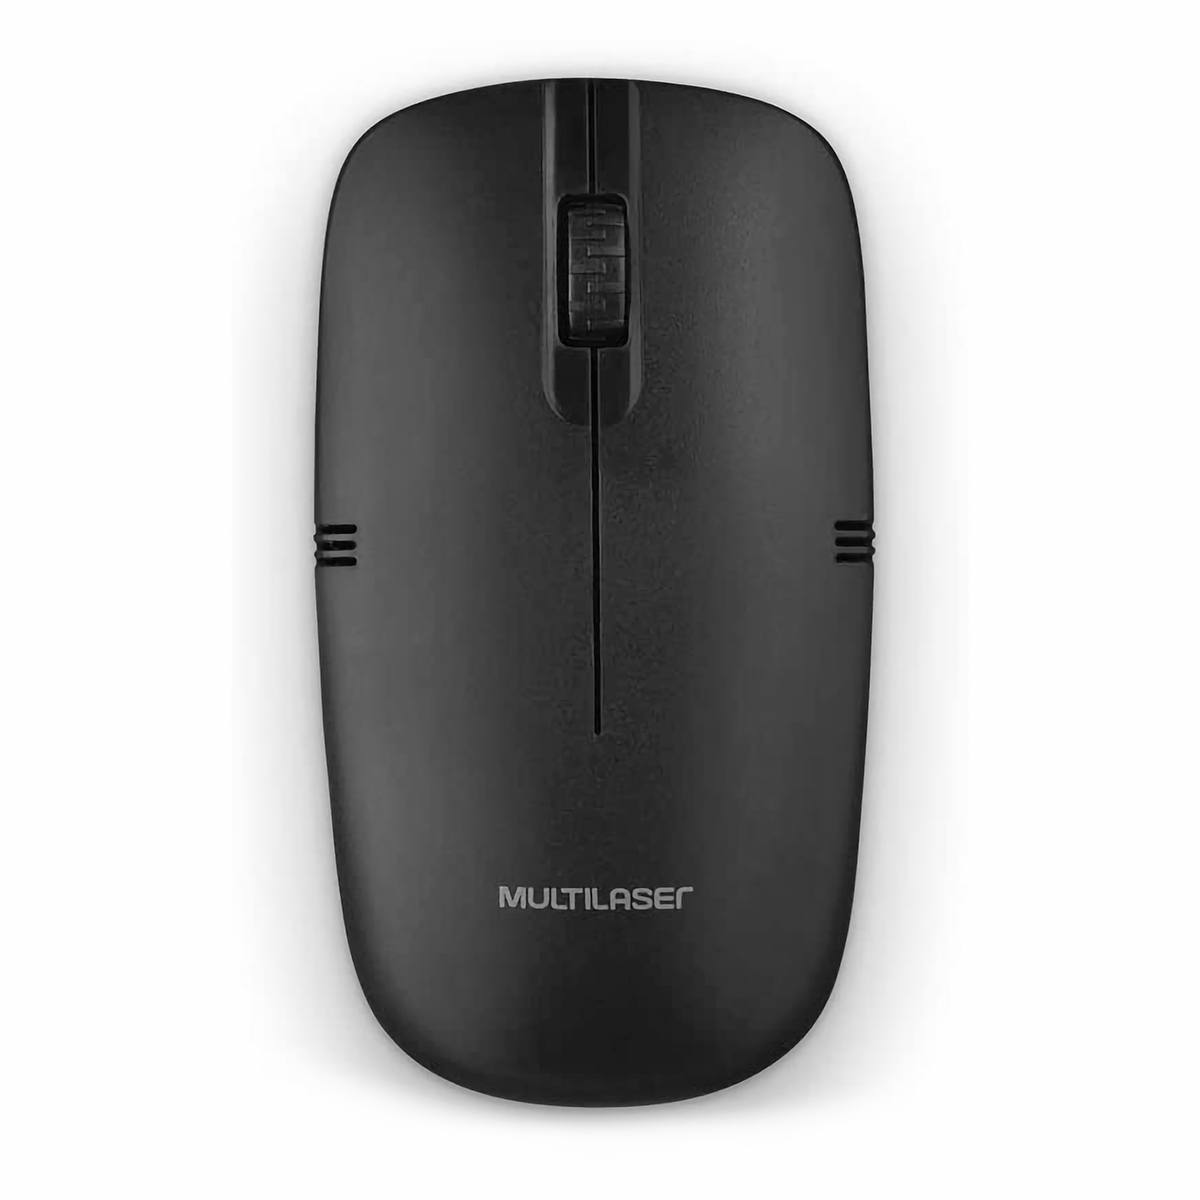 Mouse Sem Fio 1200DPI 2.4GHZ Wireless USB Preto Multilaser MO285